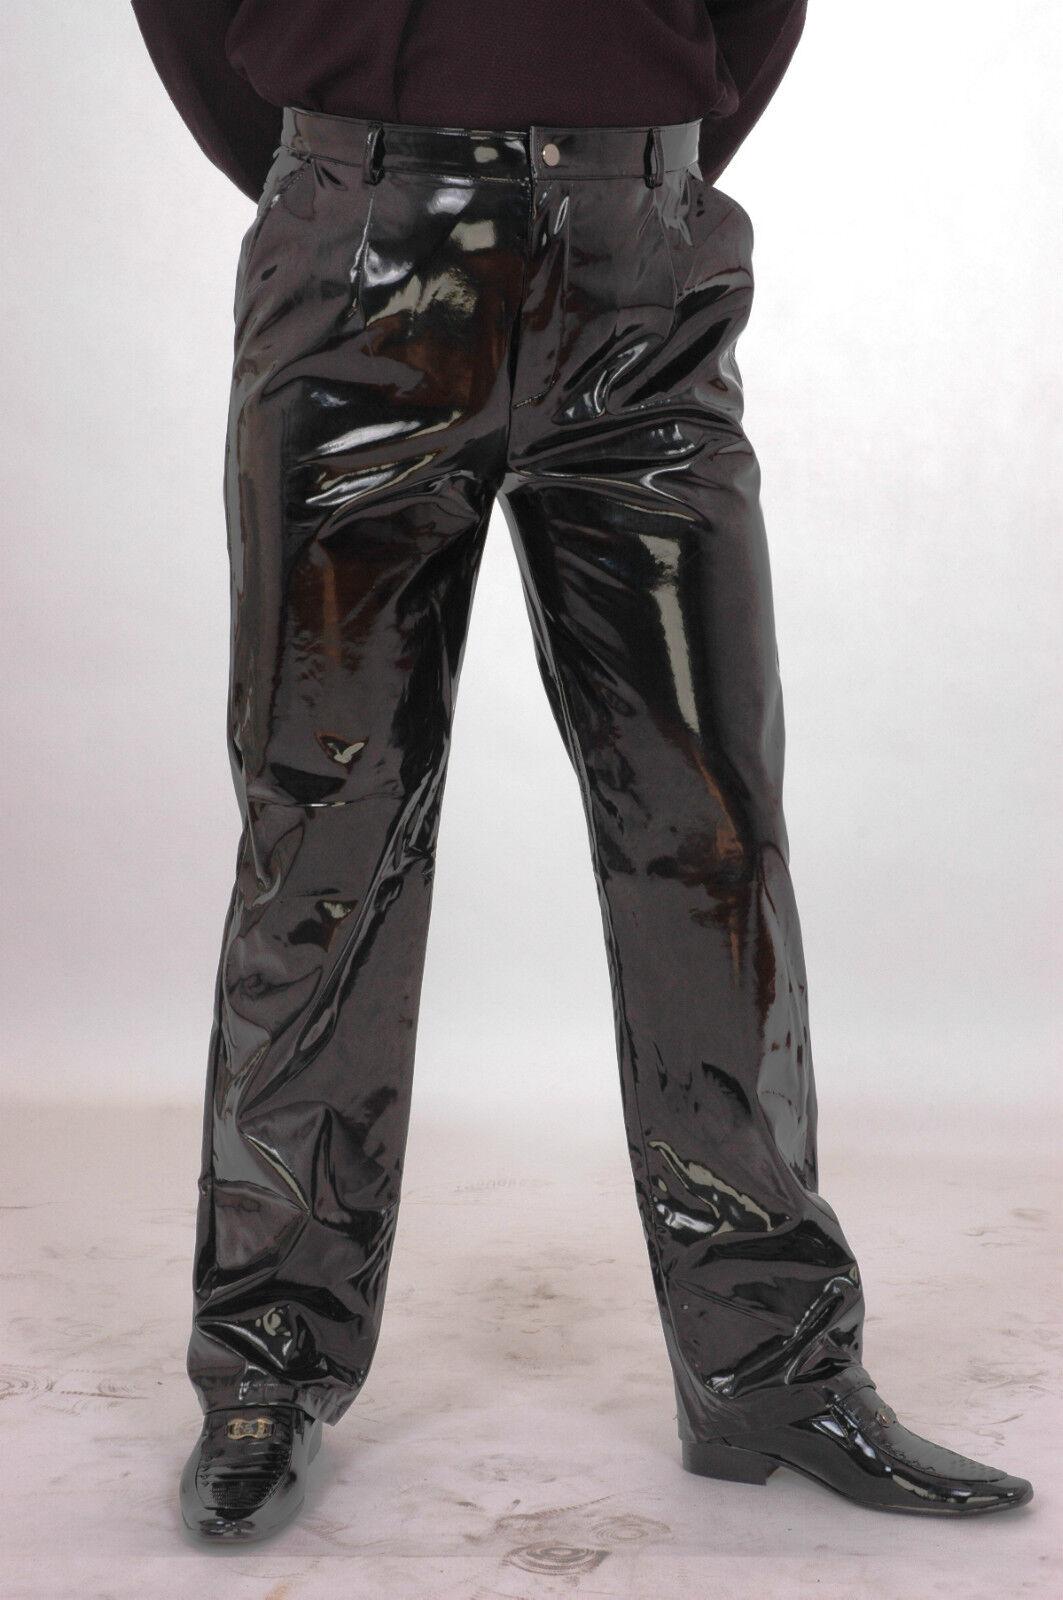 Lackina-Lack Hose im Jeans Style für Ihn